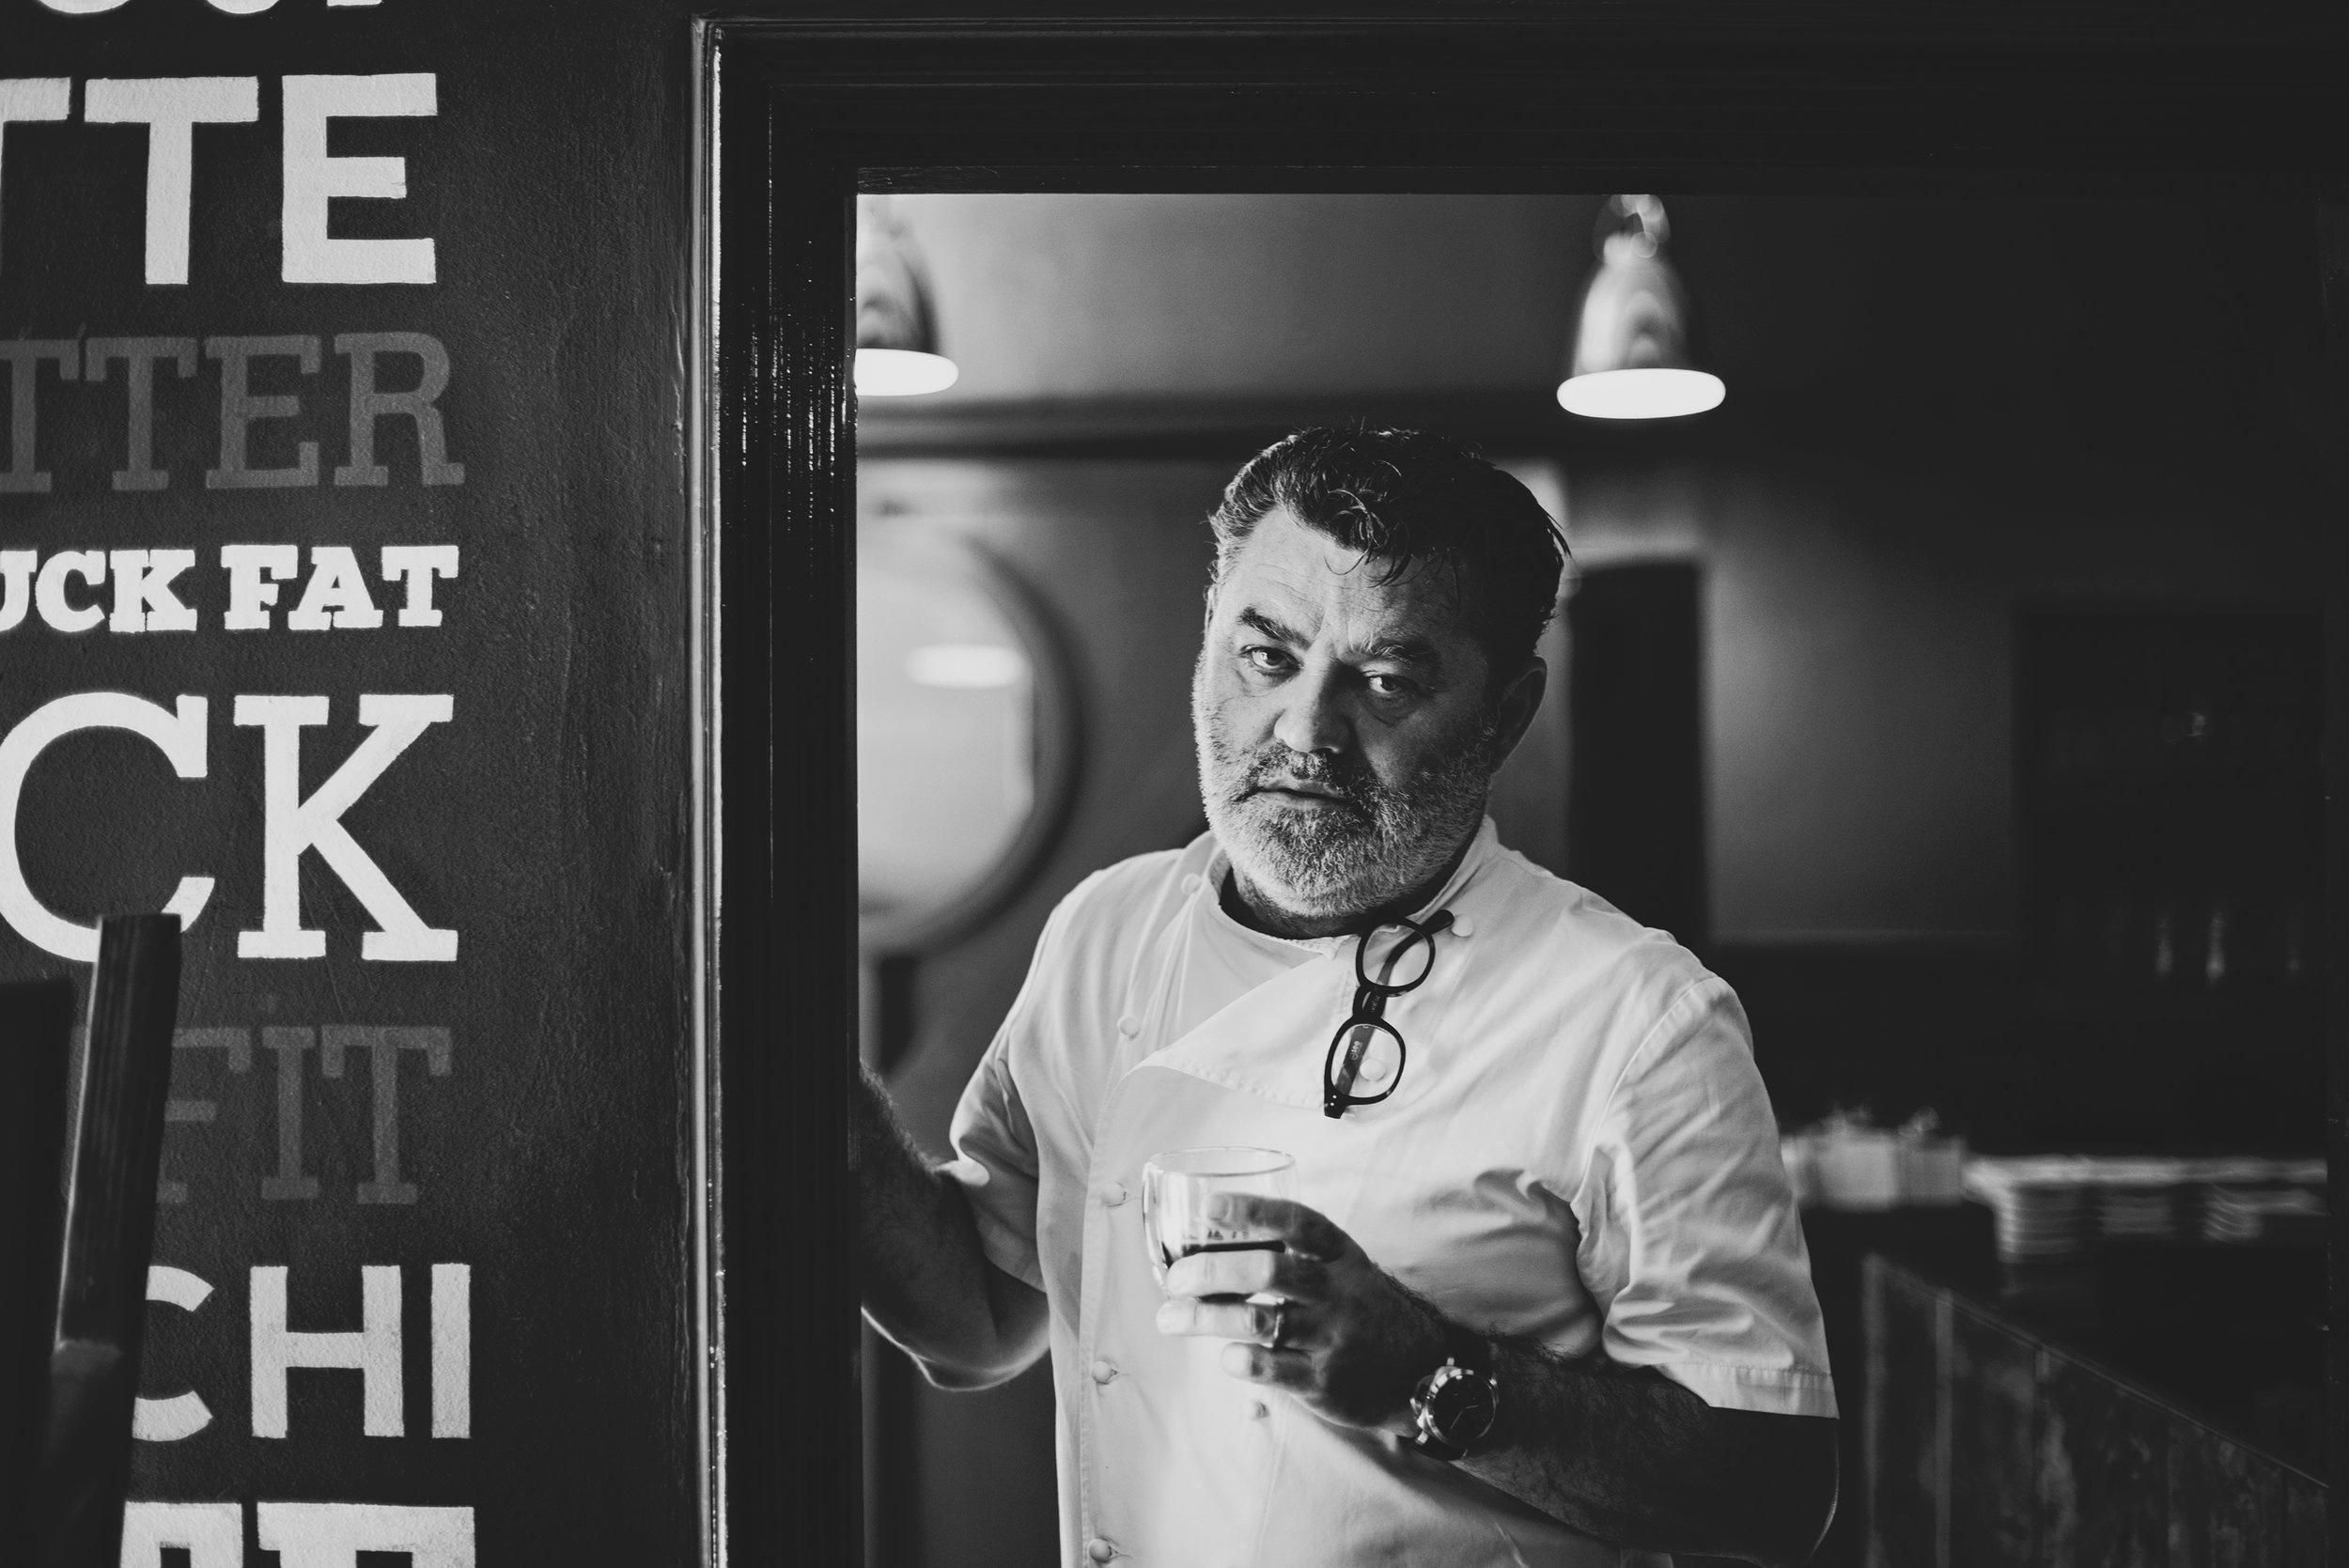 ChefswarehouseBreeNov2017ClaireGunnPrint%2811%29.jpg